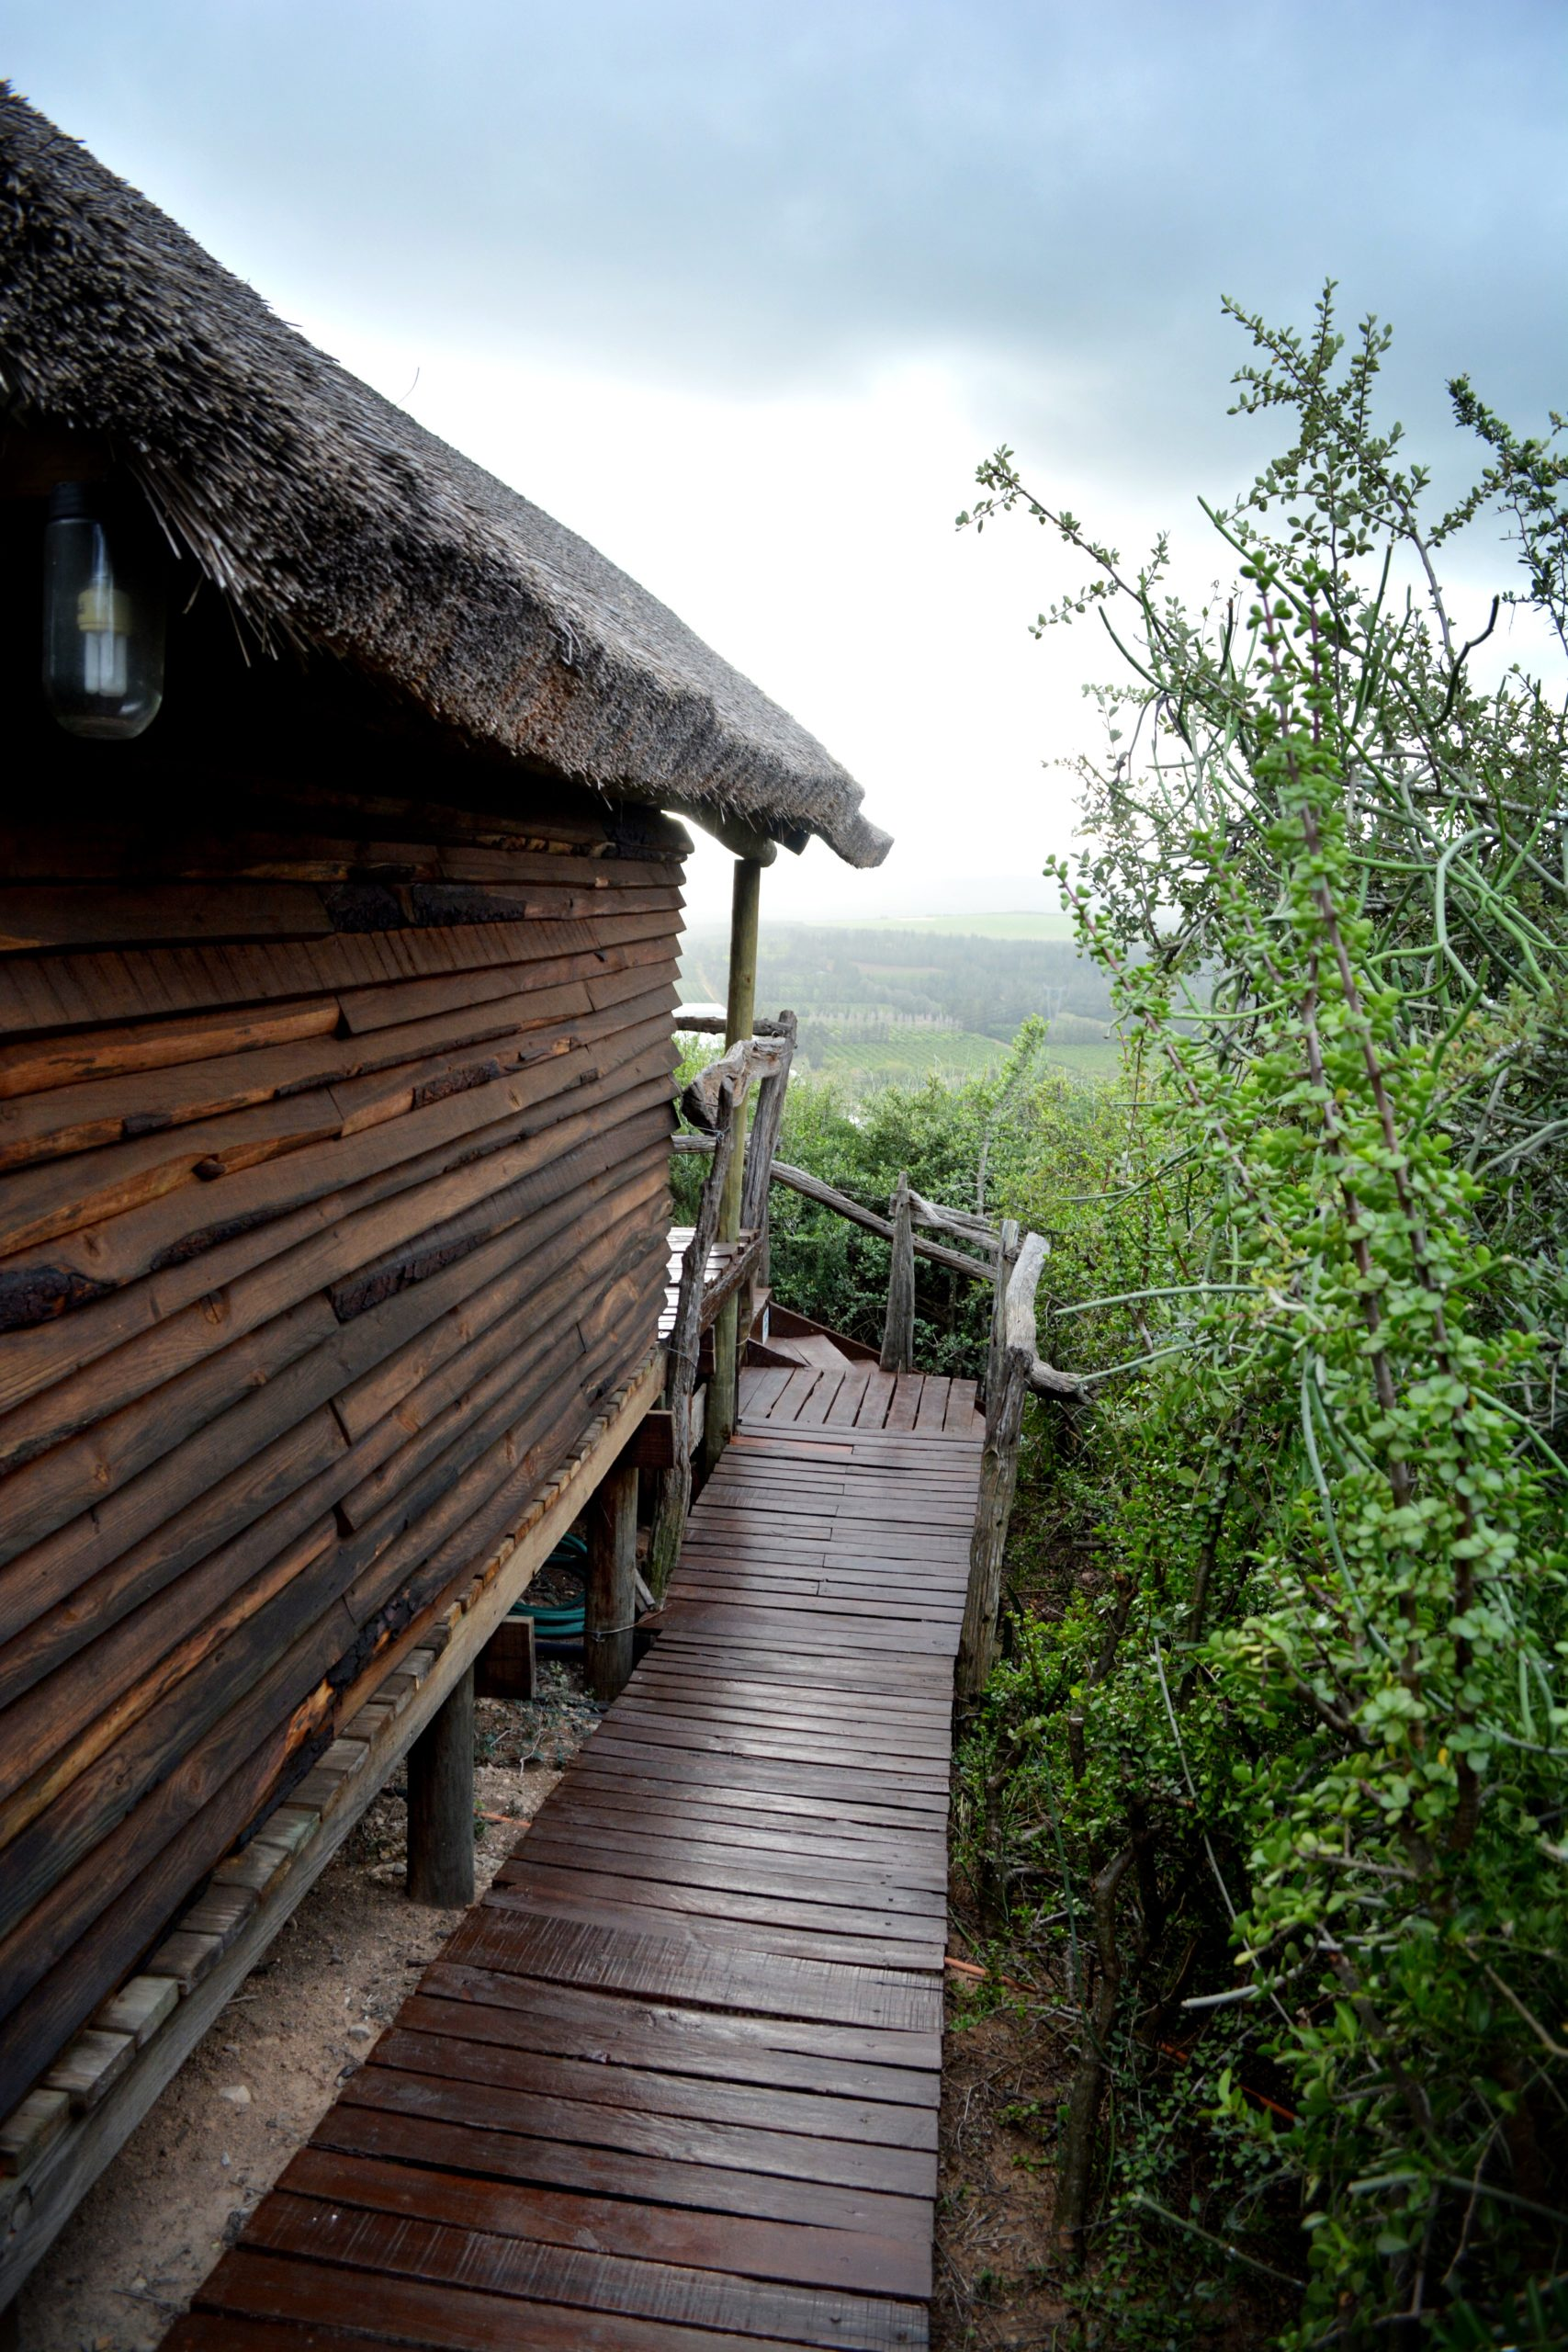 Addo Dung Beetle Bush Cabins-02